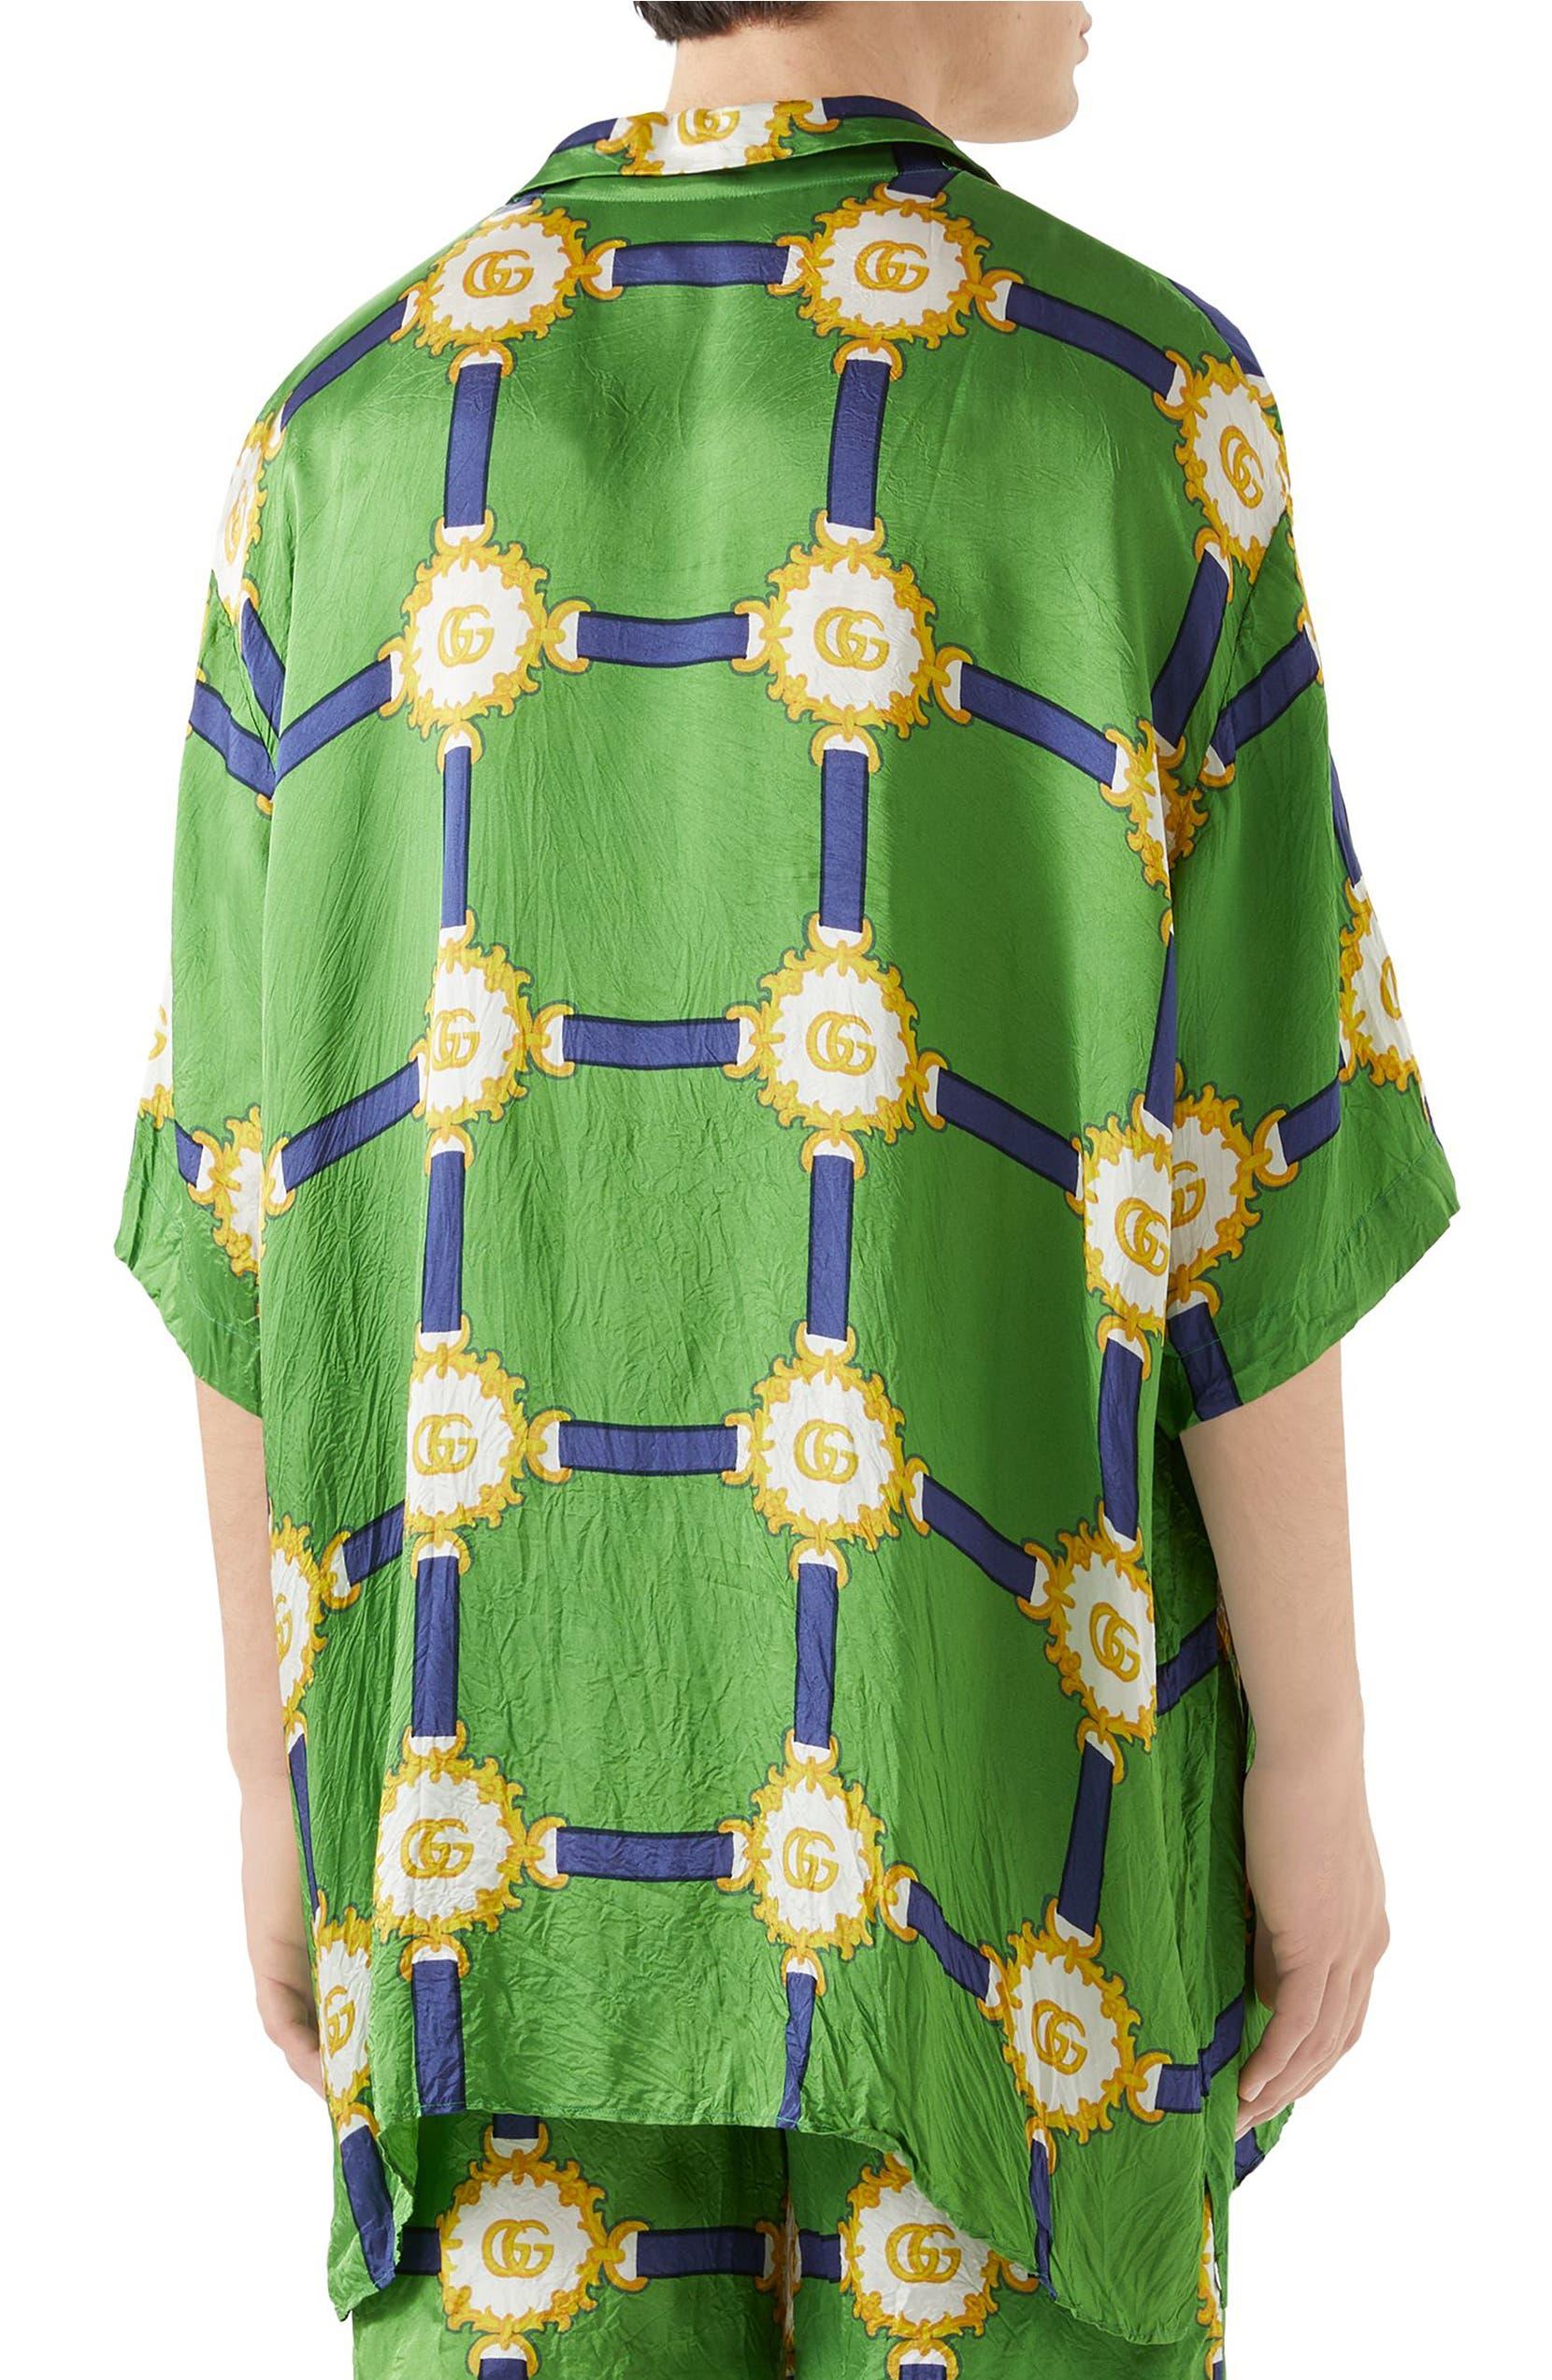 0a809dfea93a Gucci GG Harness Print Bowling Shirt | Nordstrom